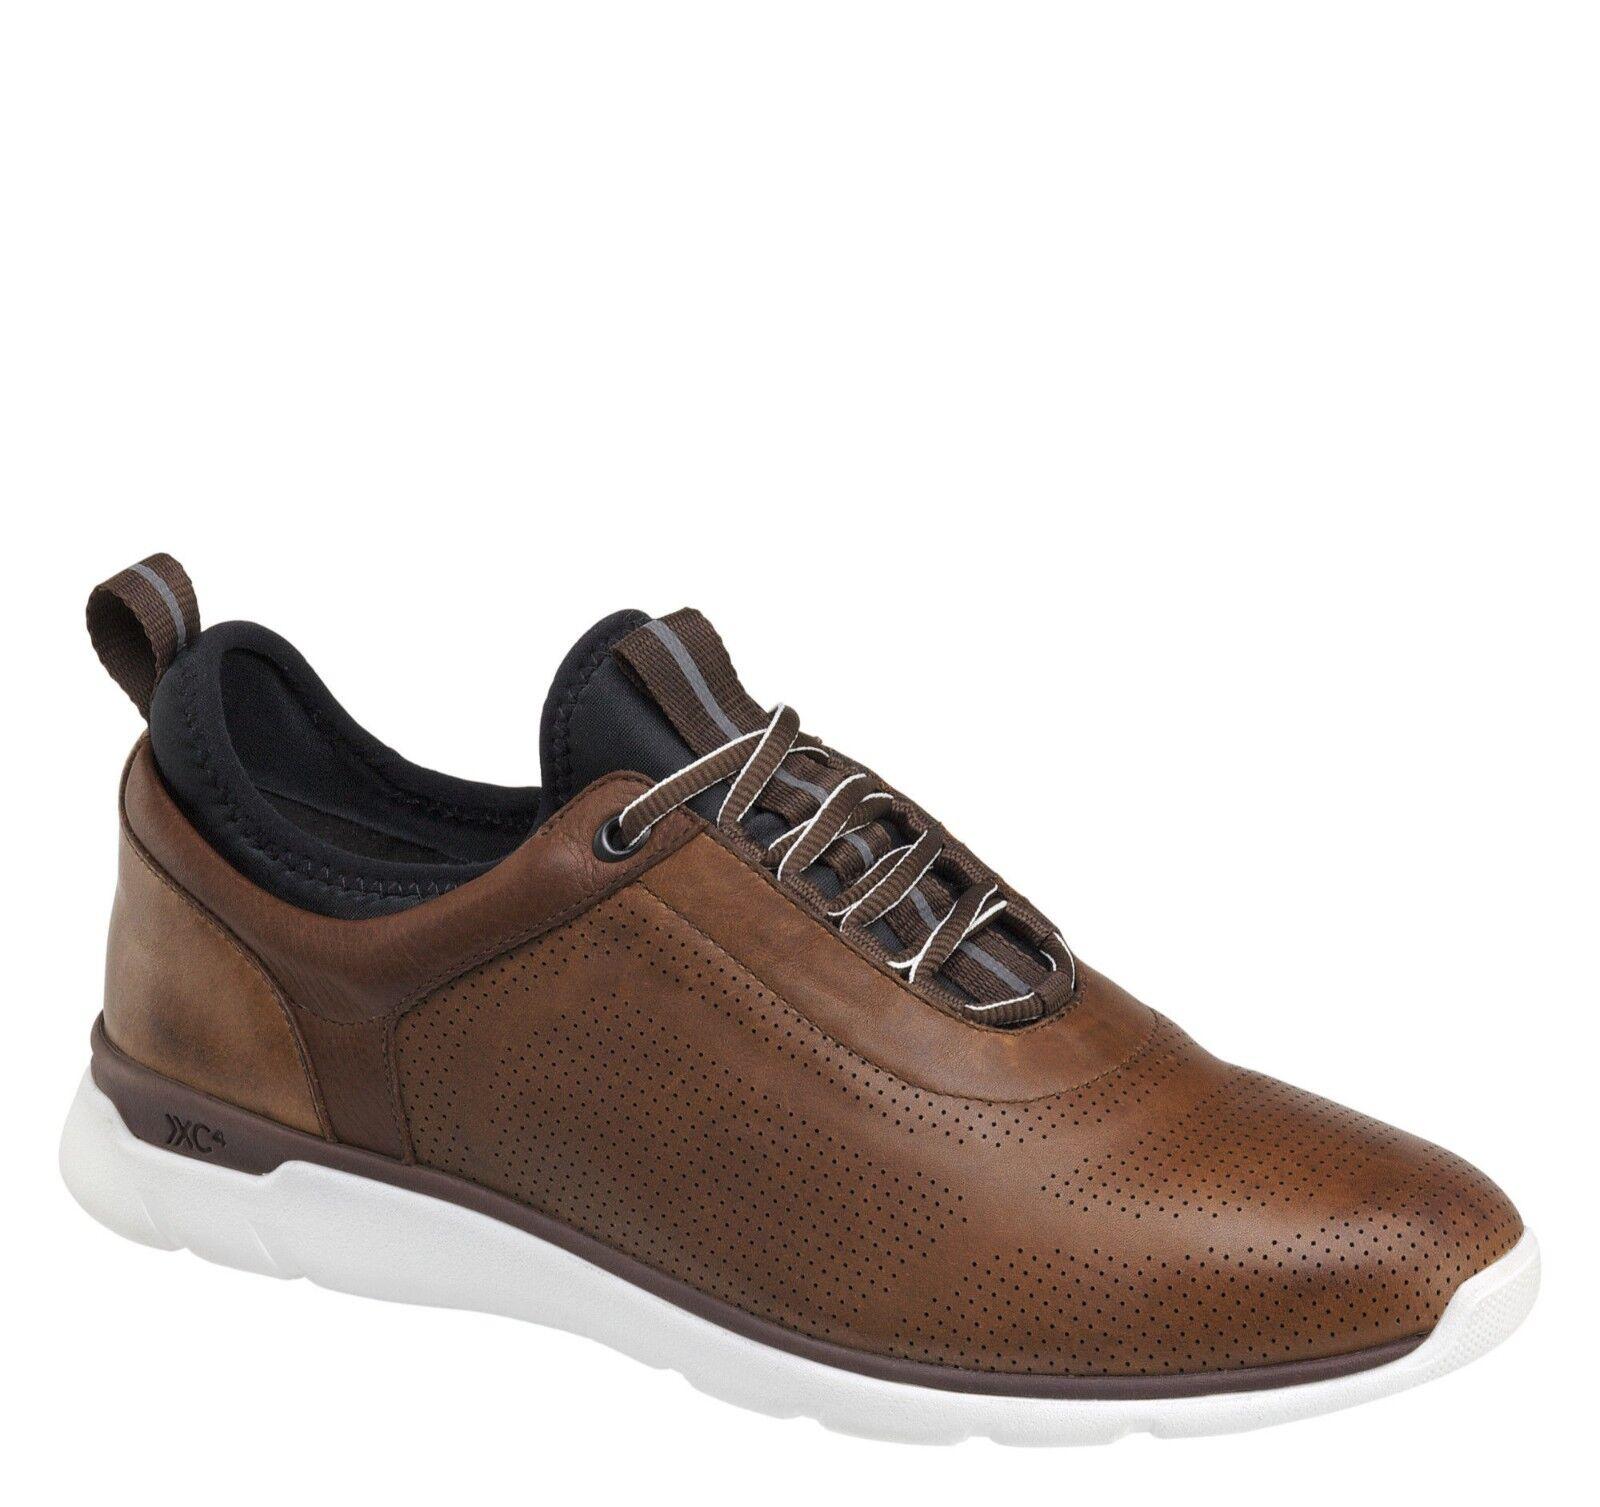 Johnston Murphy Prentiss Mahogany Leather Multi-Width Breathable shoes NIB 10 M